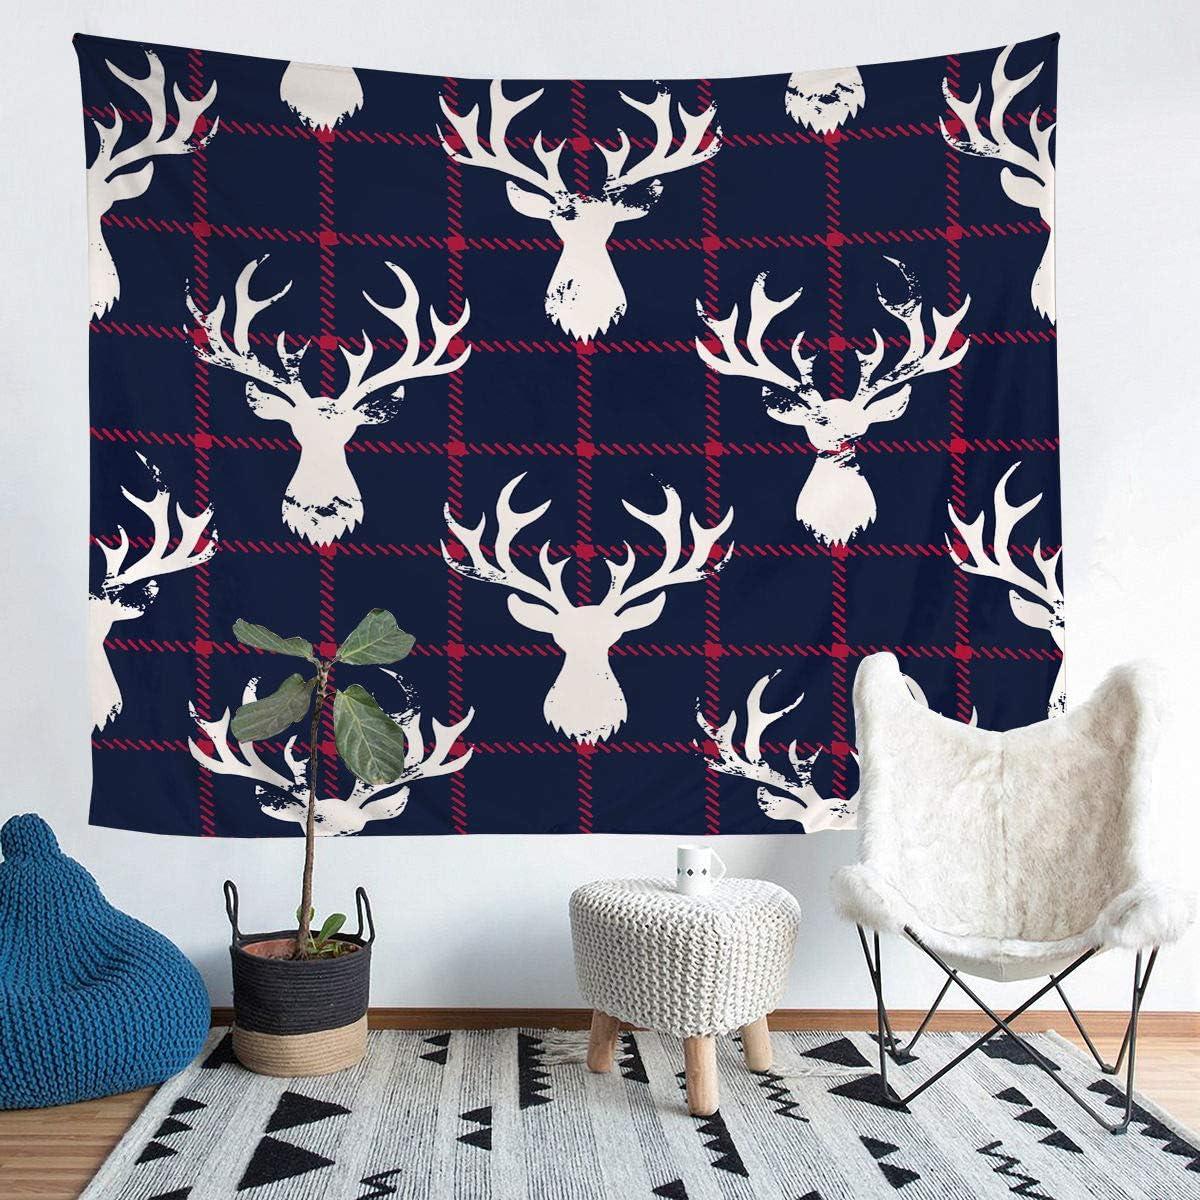 Erosebridal Elk Tapestry, Christmas Tapestries, Deer Head Wildlife Bedding Throw Blanket, Animal Plaid Pattern Print Wall Hangings Wall Art Living Room Dorm Decor for Adult Medium 59x59